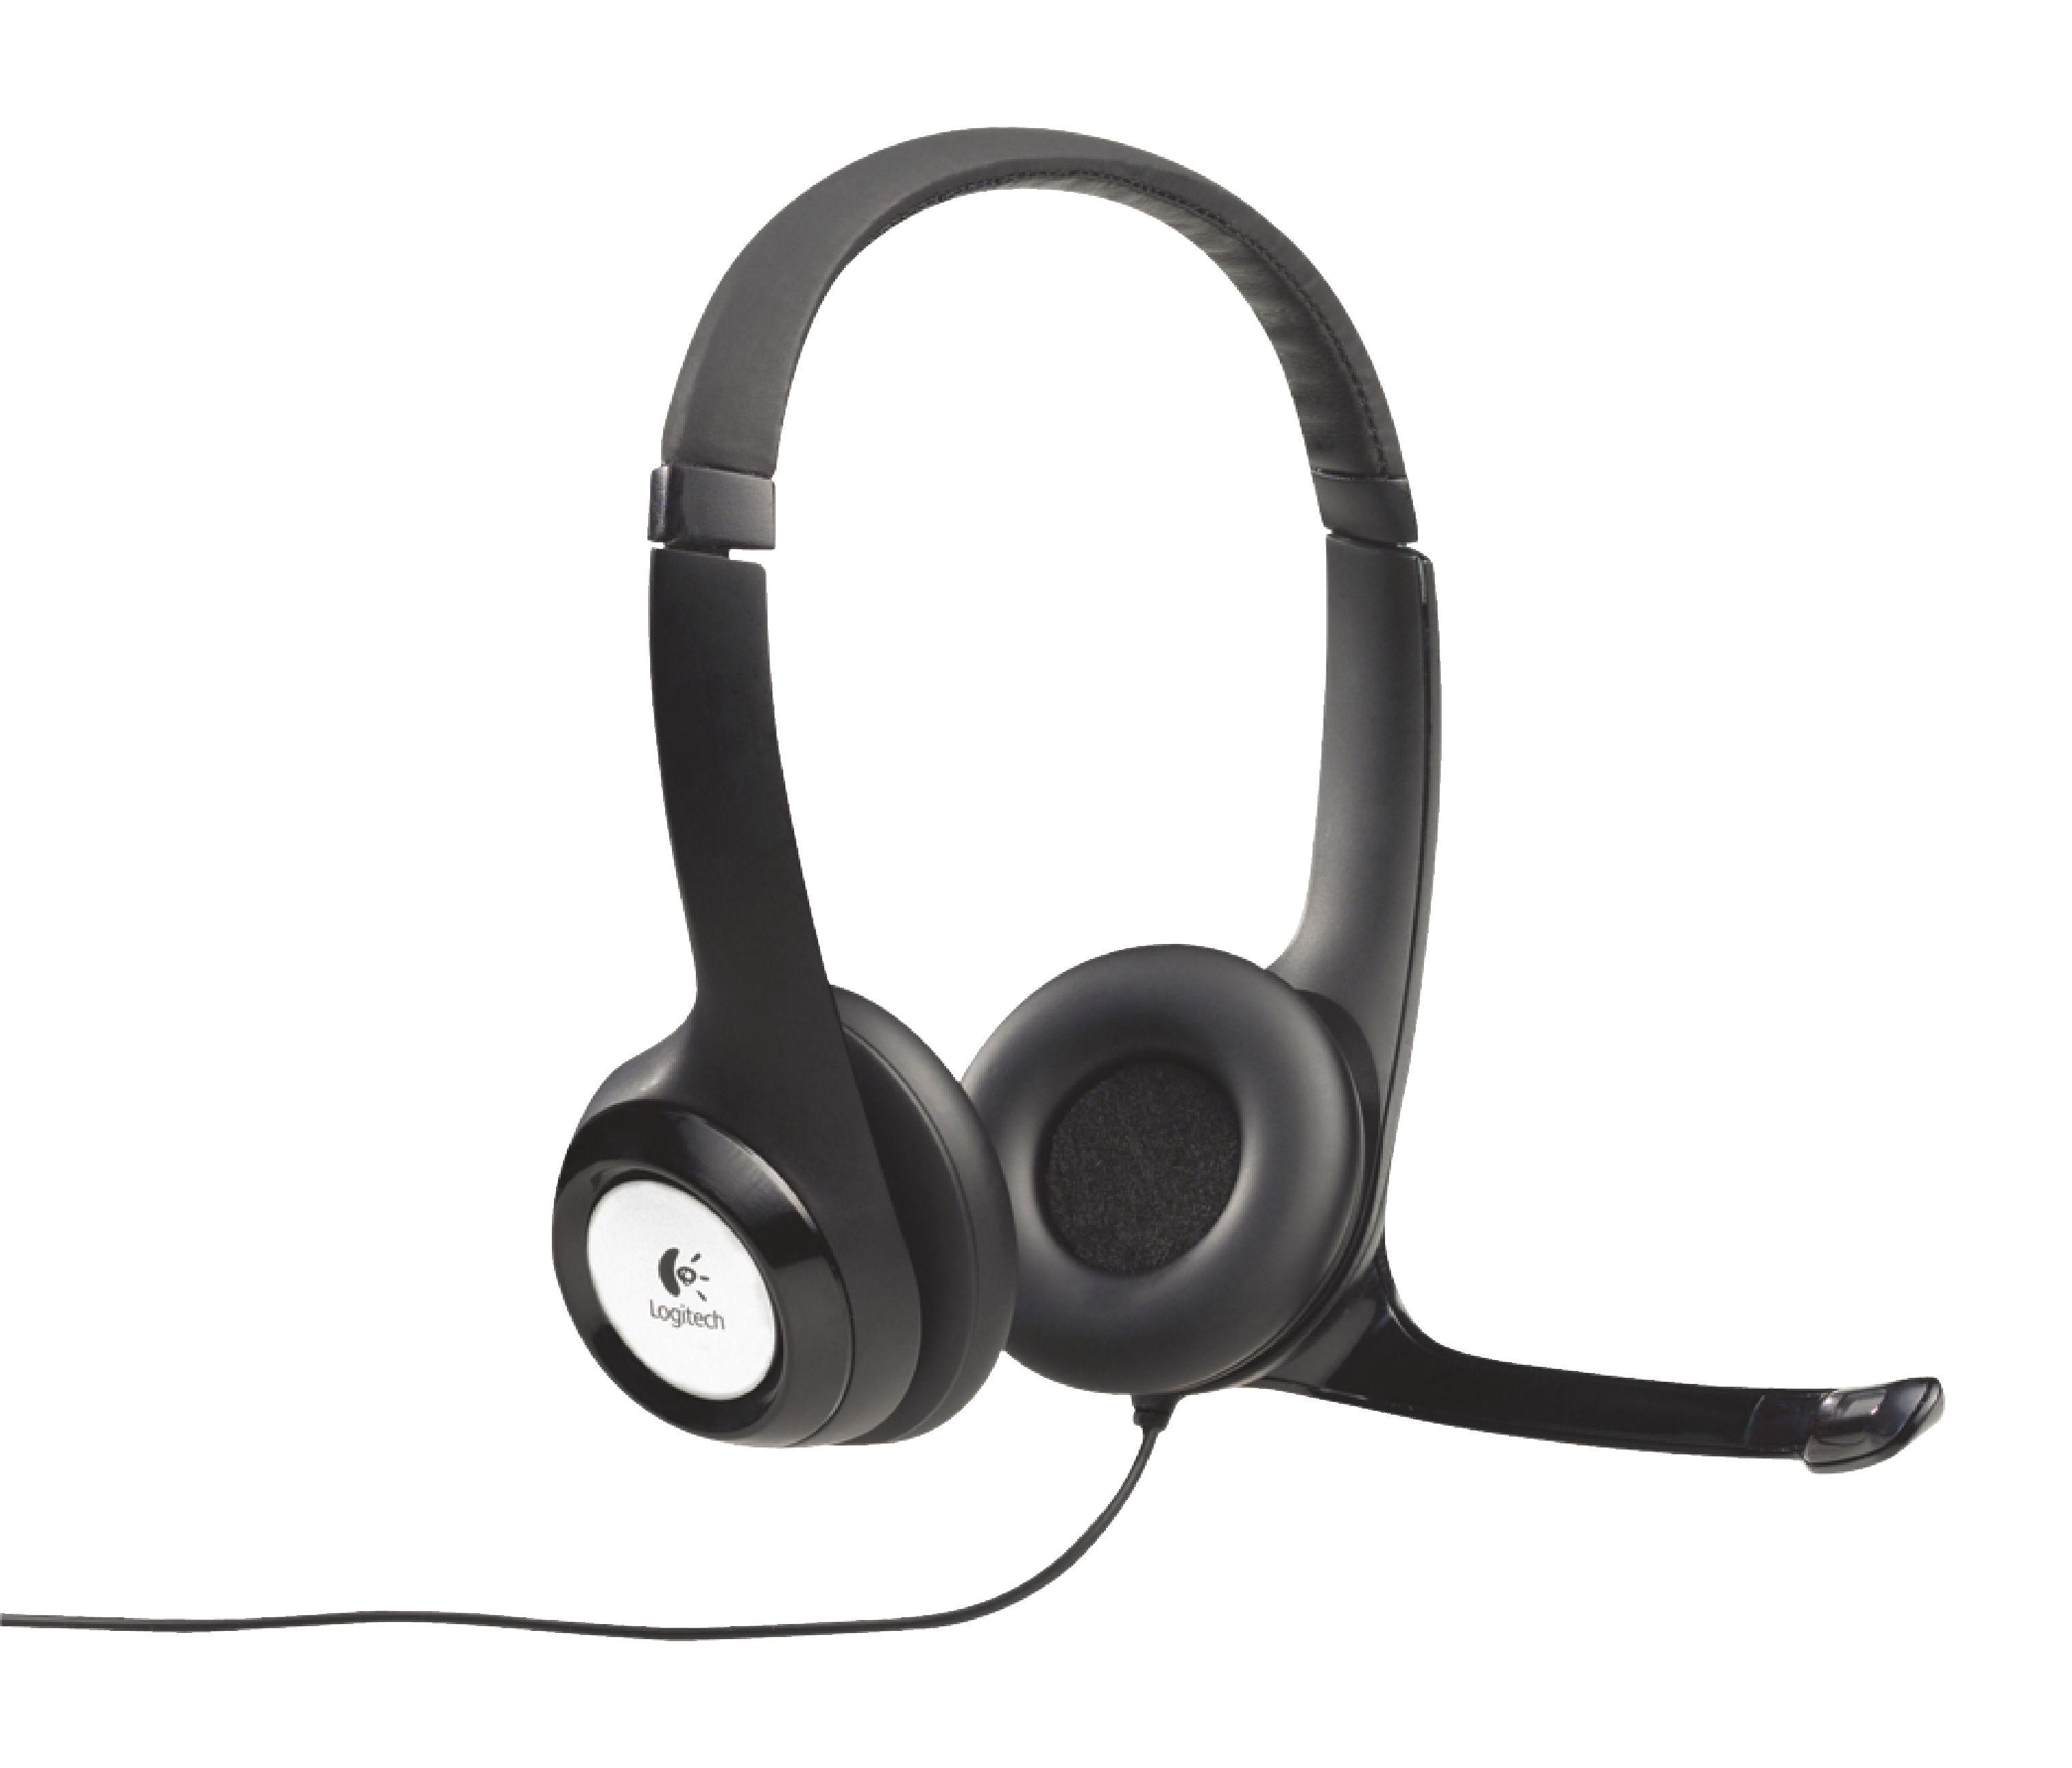 Auriculares USB H390 de Logitech con micr?fono ajustable Color Negro